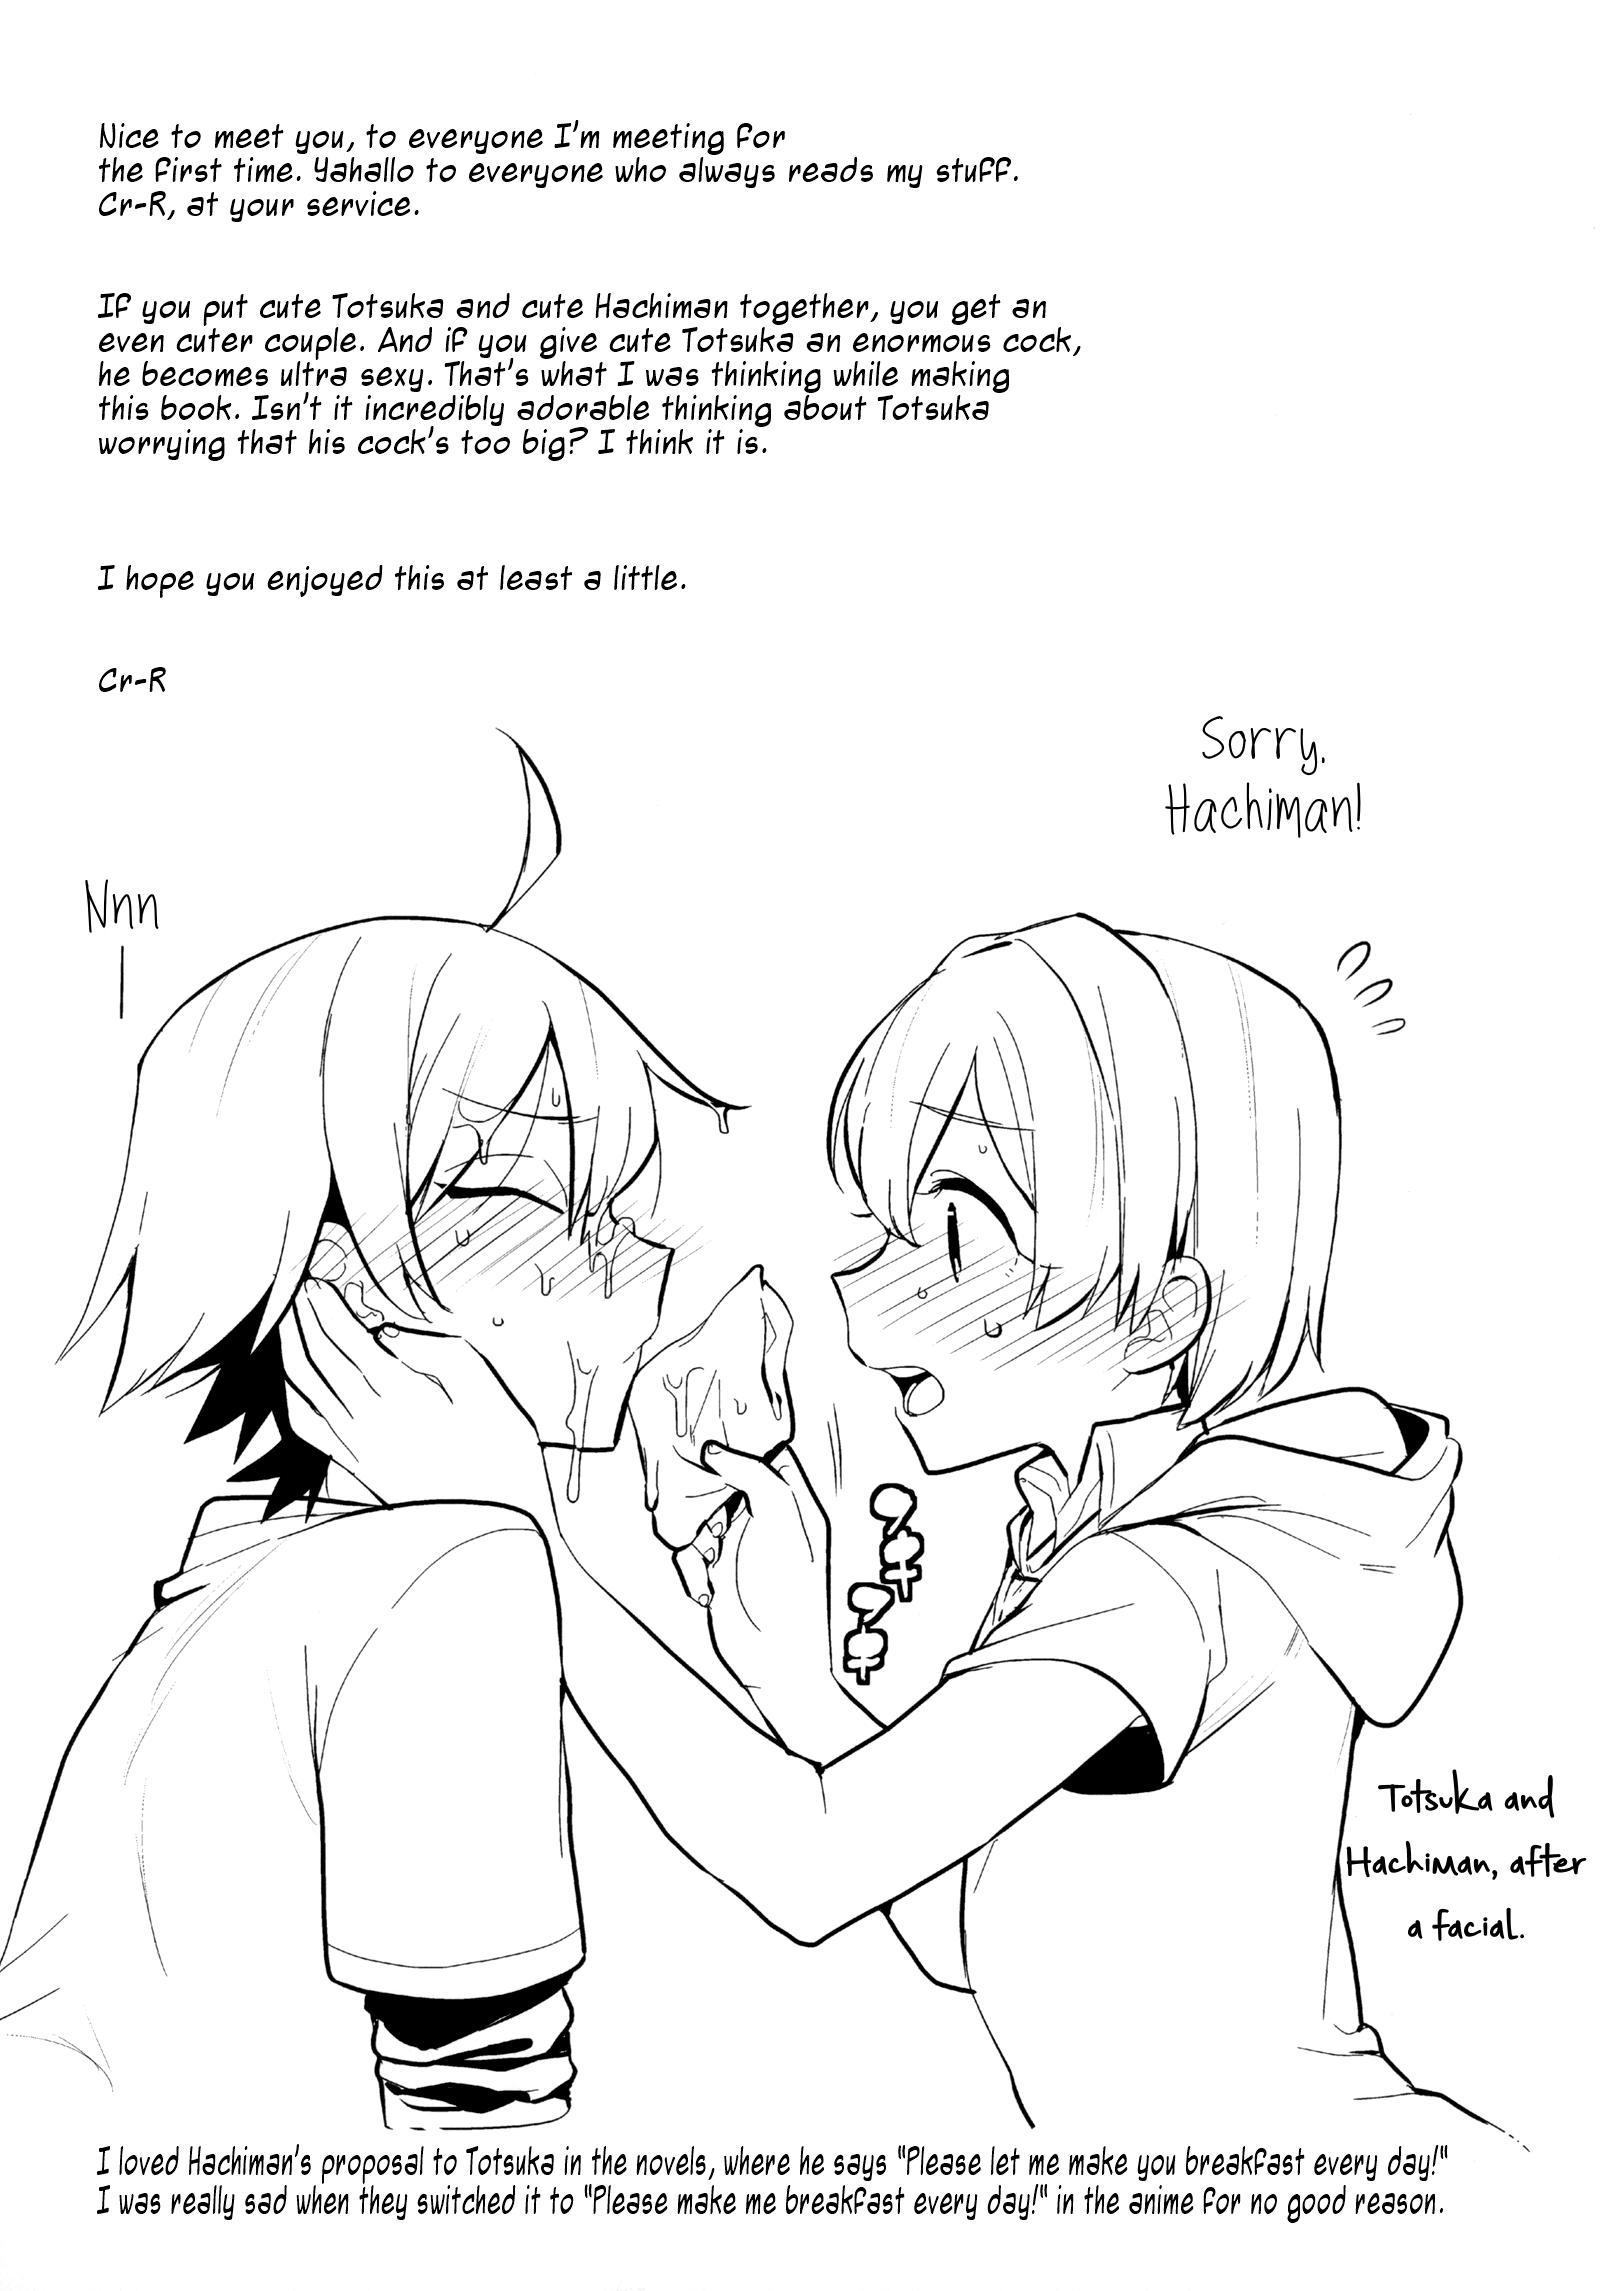 Tenshi Kawaii Totsuka no Dekamara de Mesu ni Sareru Hachiman no Hon. | Cute Angel Totsuka Turns Hachiman into His Bitch with His Elephant Cock 22